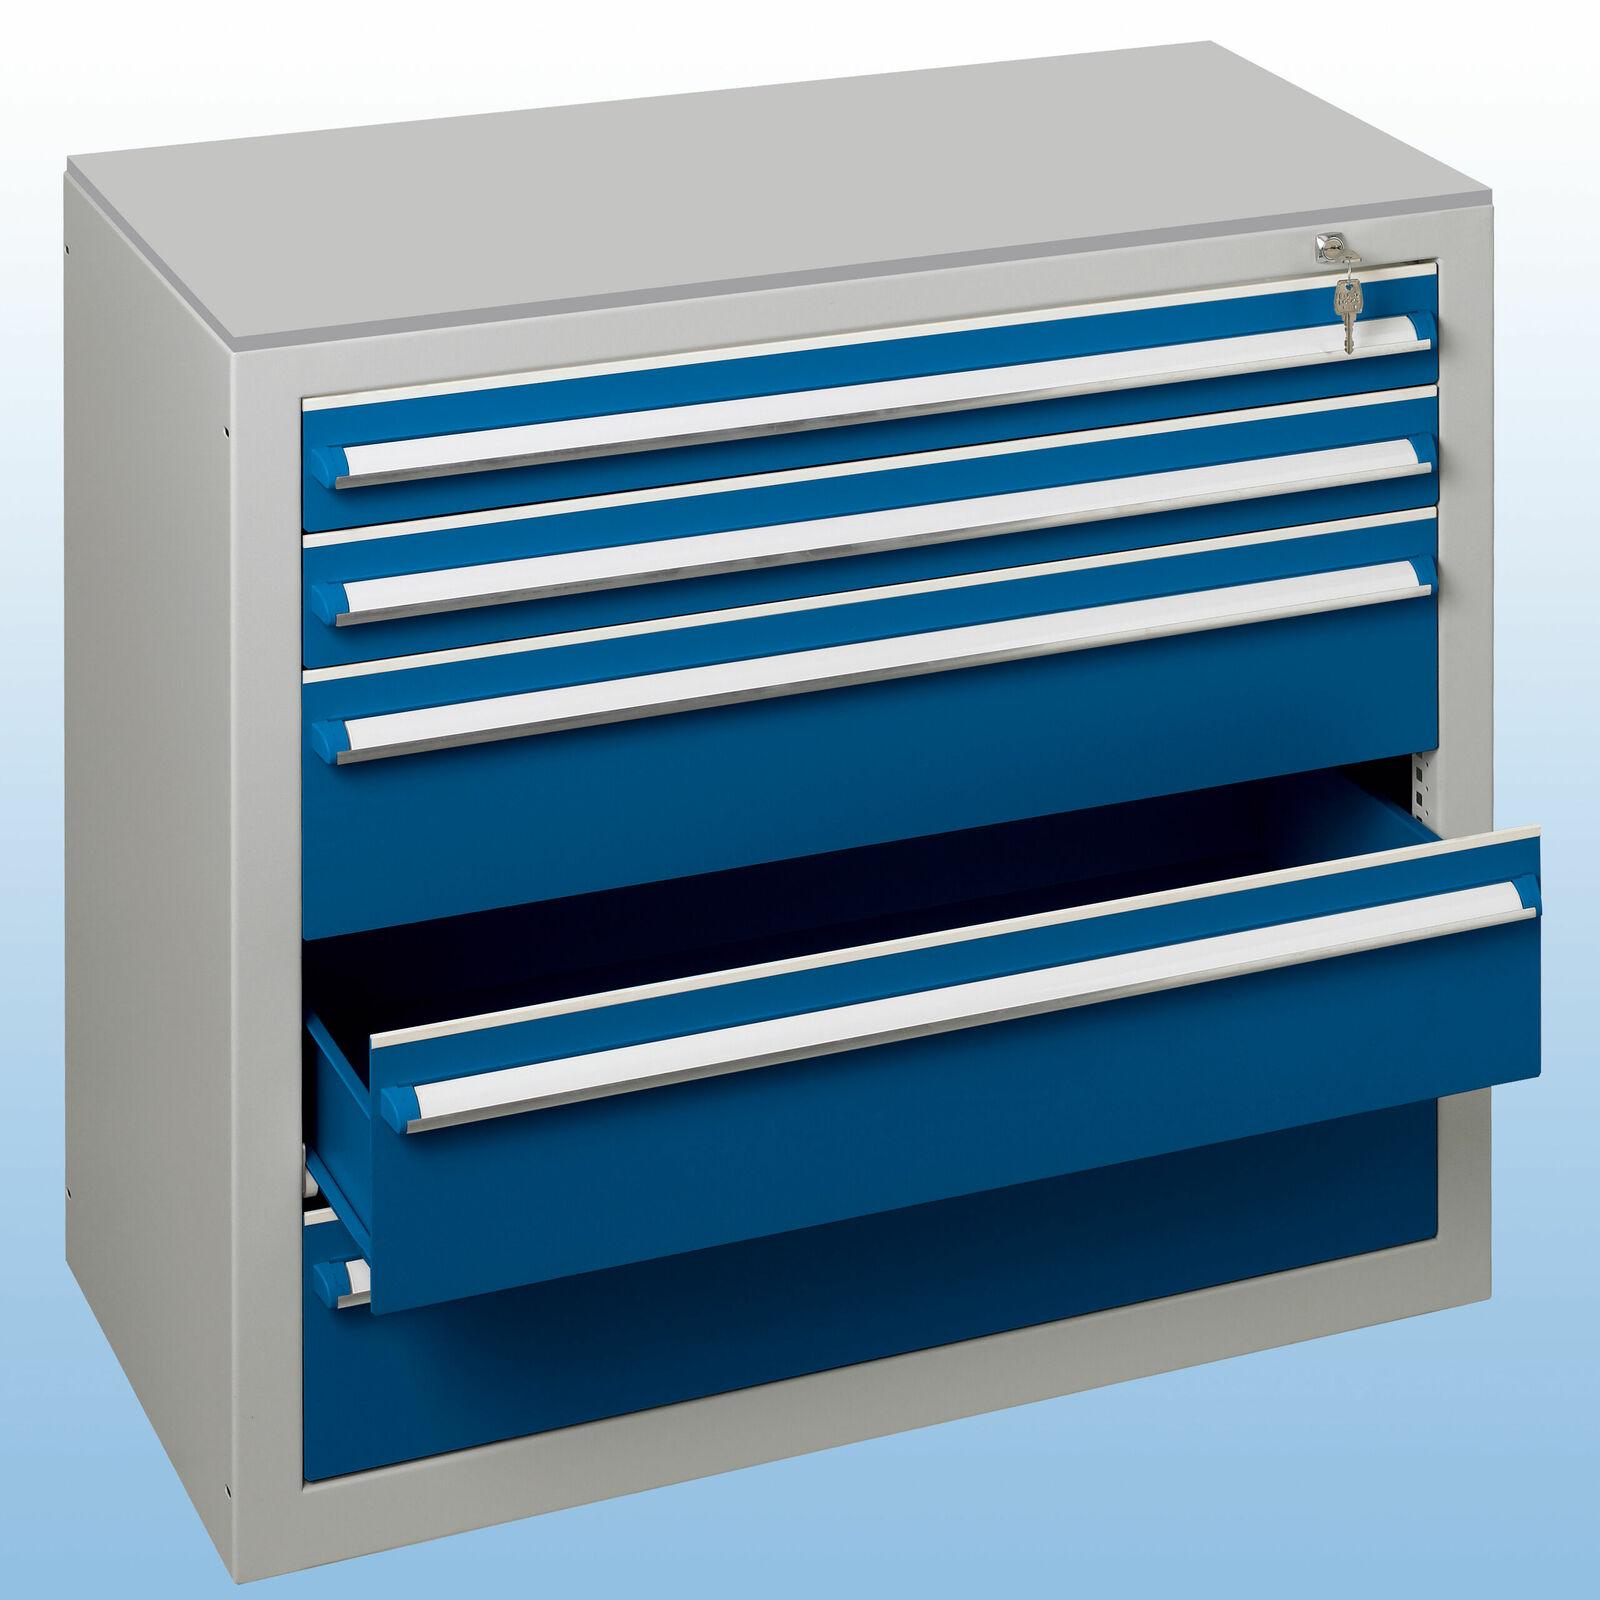 schubladenblock grau blau bei kaiser systeme. Black Bedroom Furniture Sets. Home Design Ideas